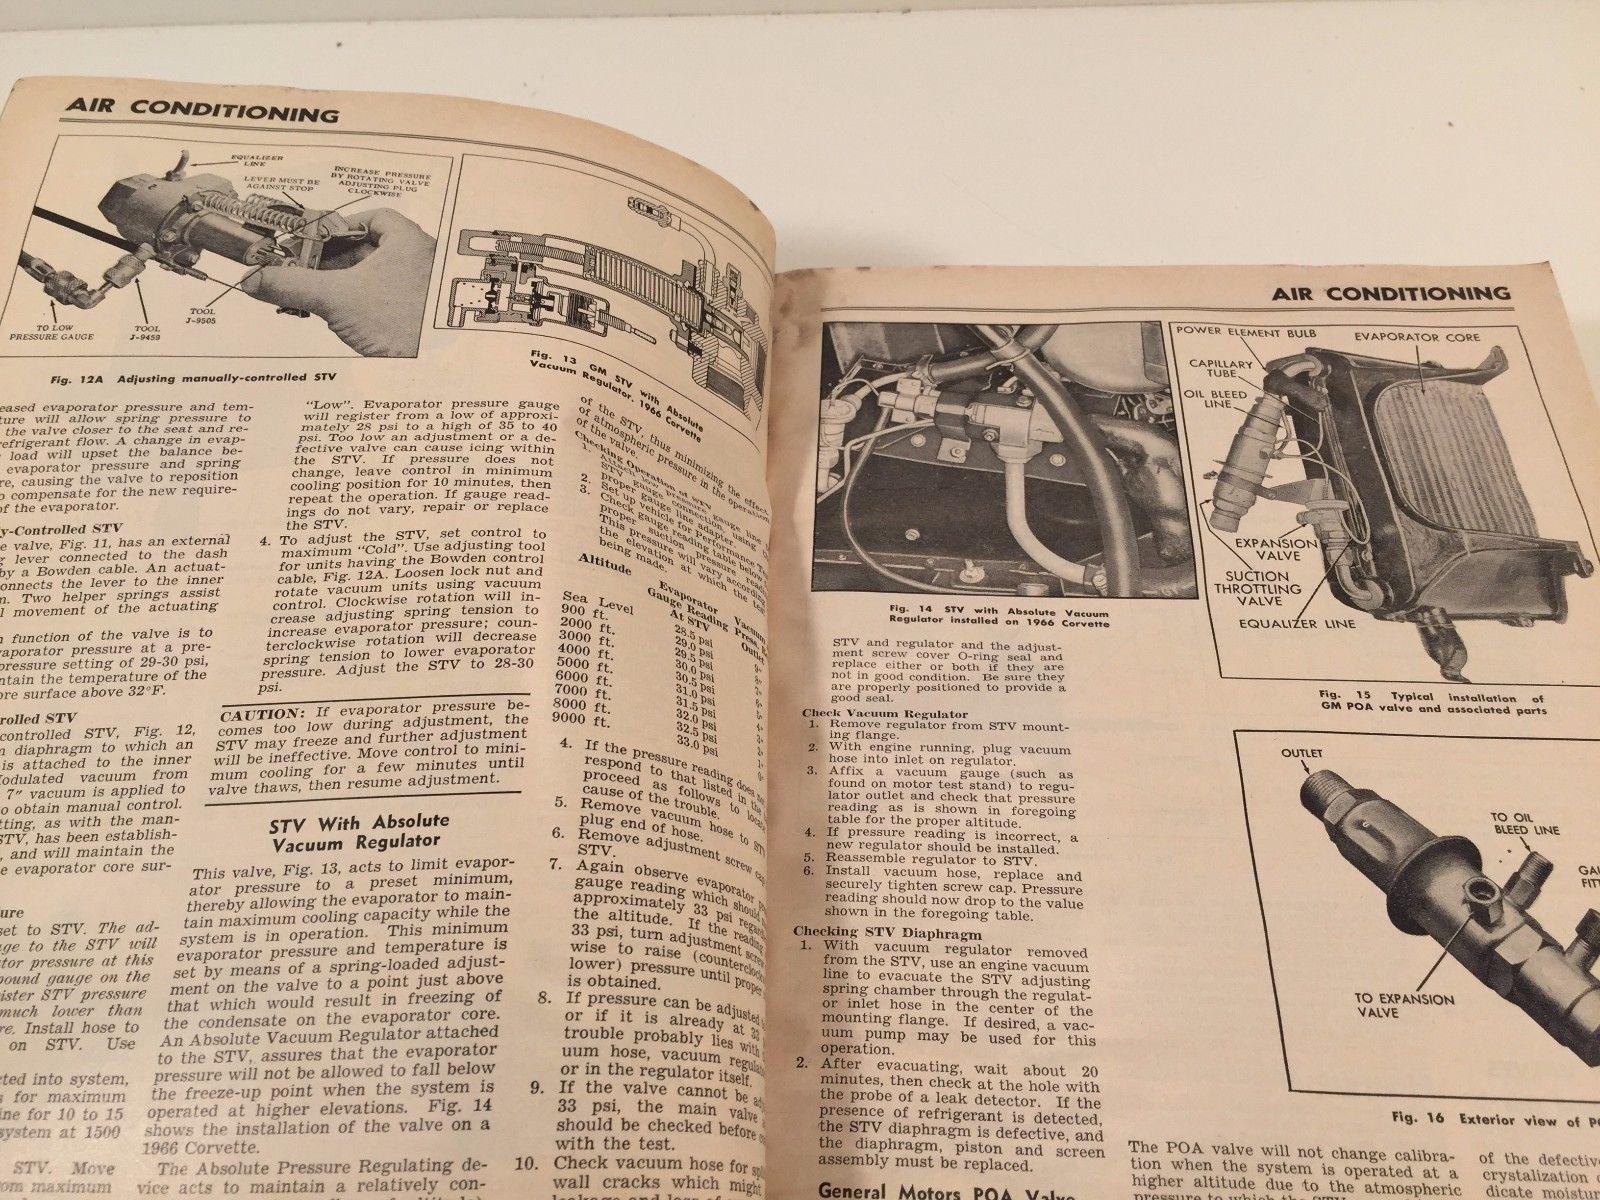 1967 Motor's Auto Repair Manual 30th Edition